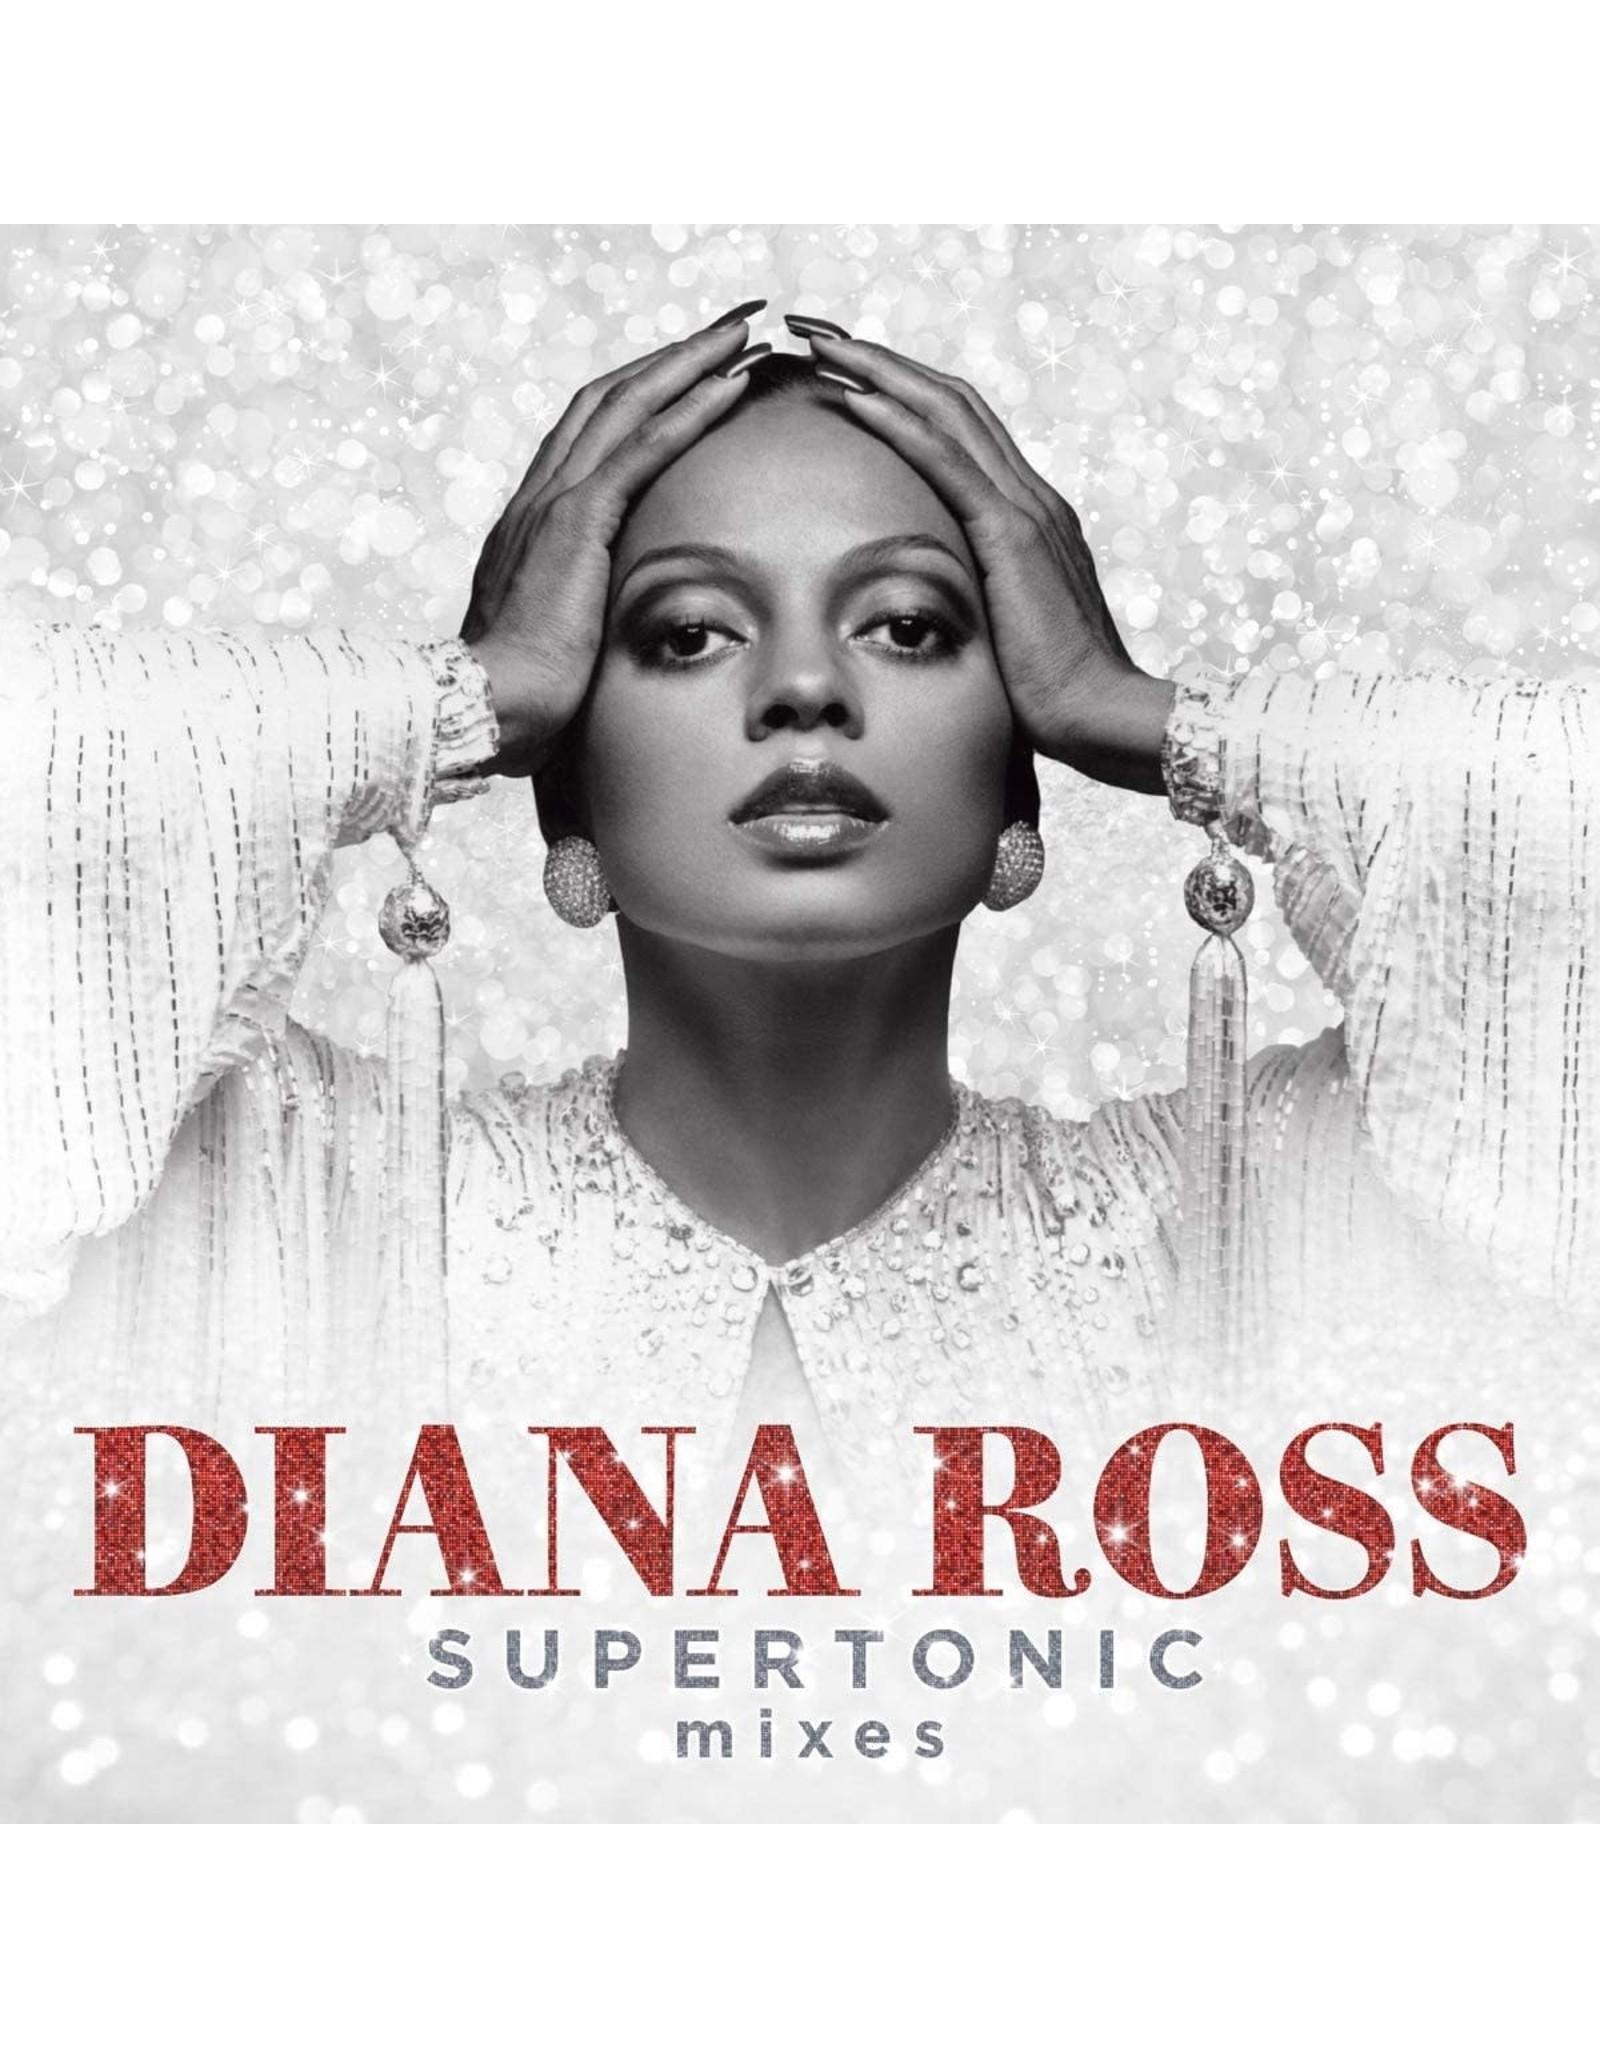 Diana Ross - Supertonic Mixes (Crystal Clear Vinyl)